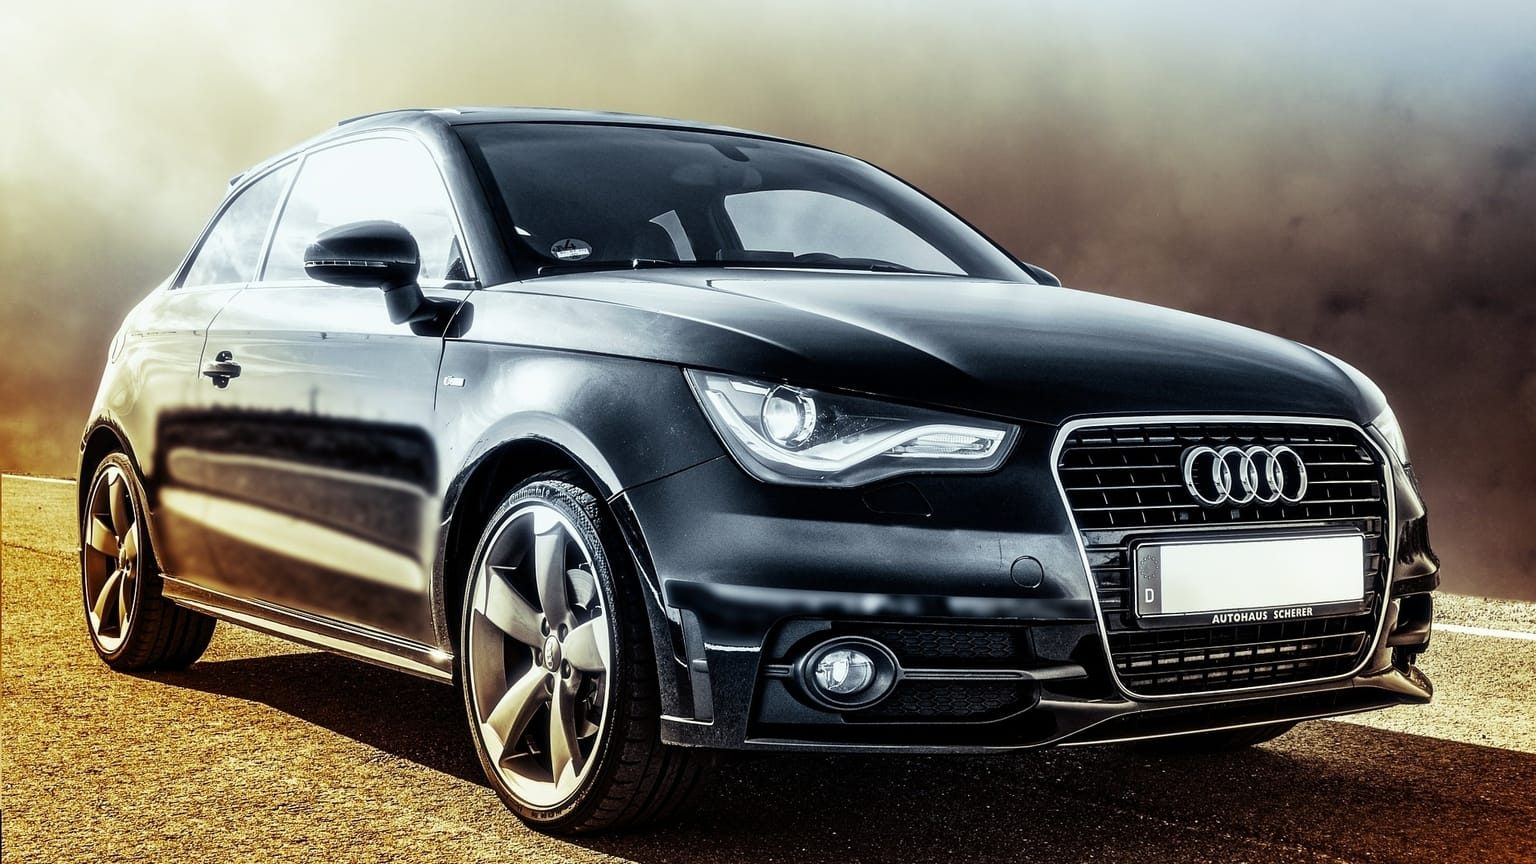 A black Audi sedan driving on a misty road